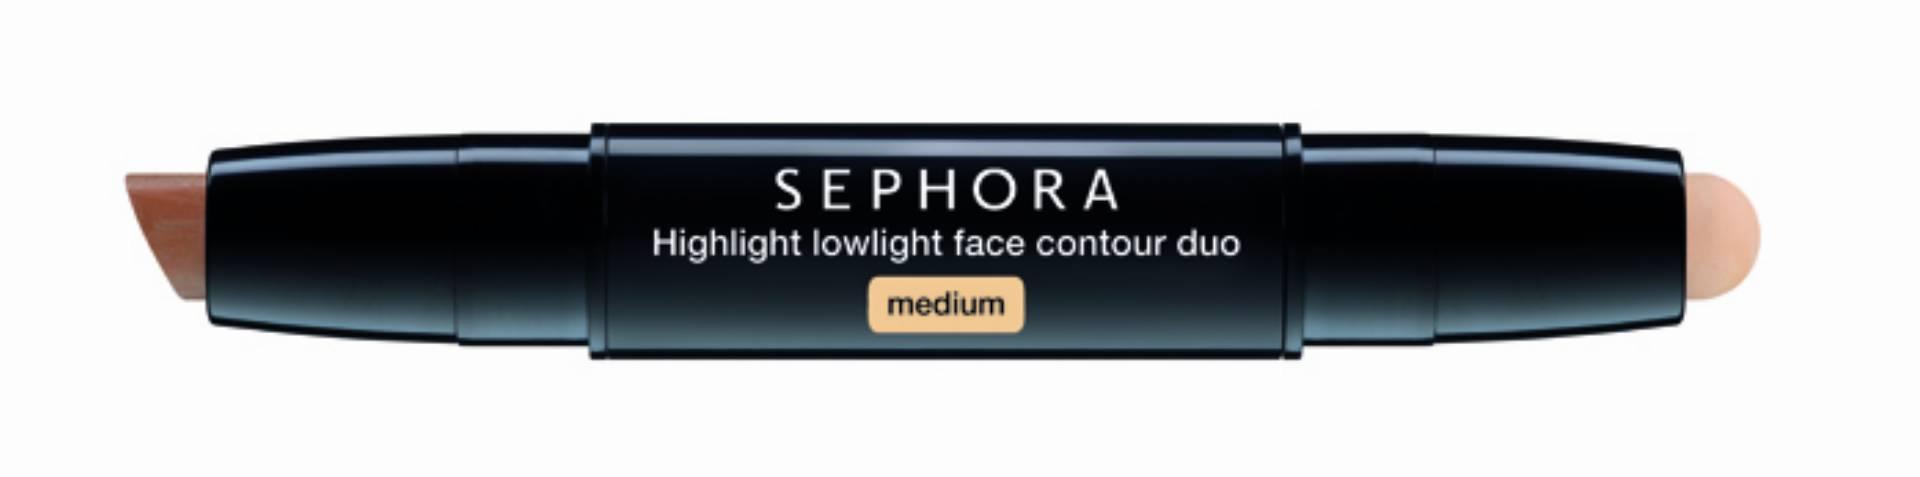 Highlight lowlight face contour duo - Medium HD